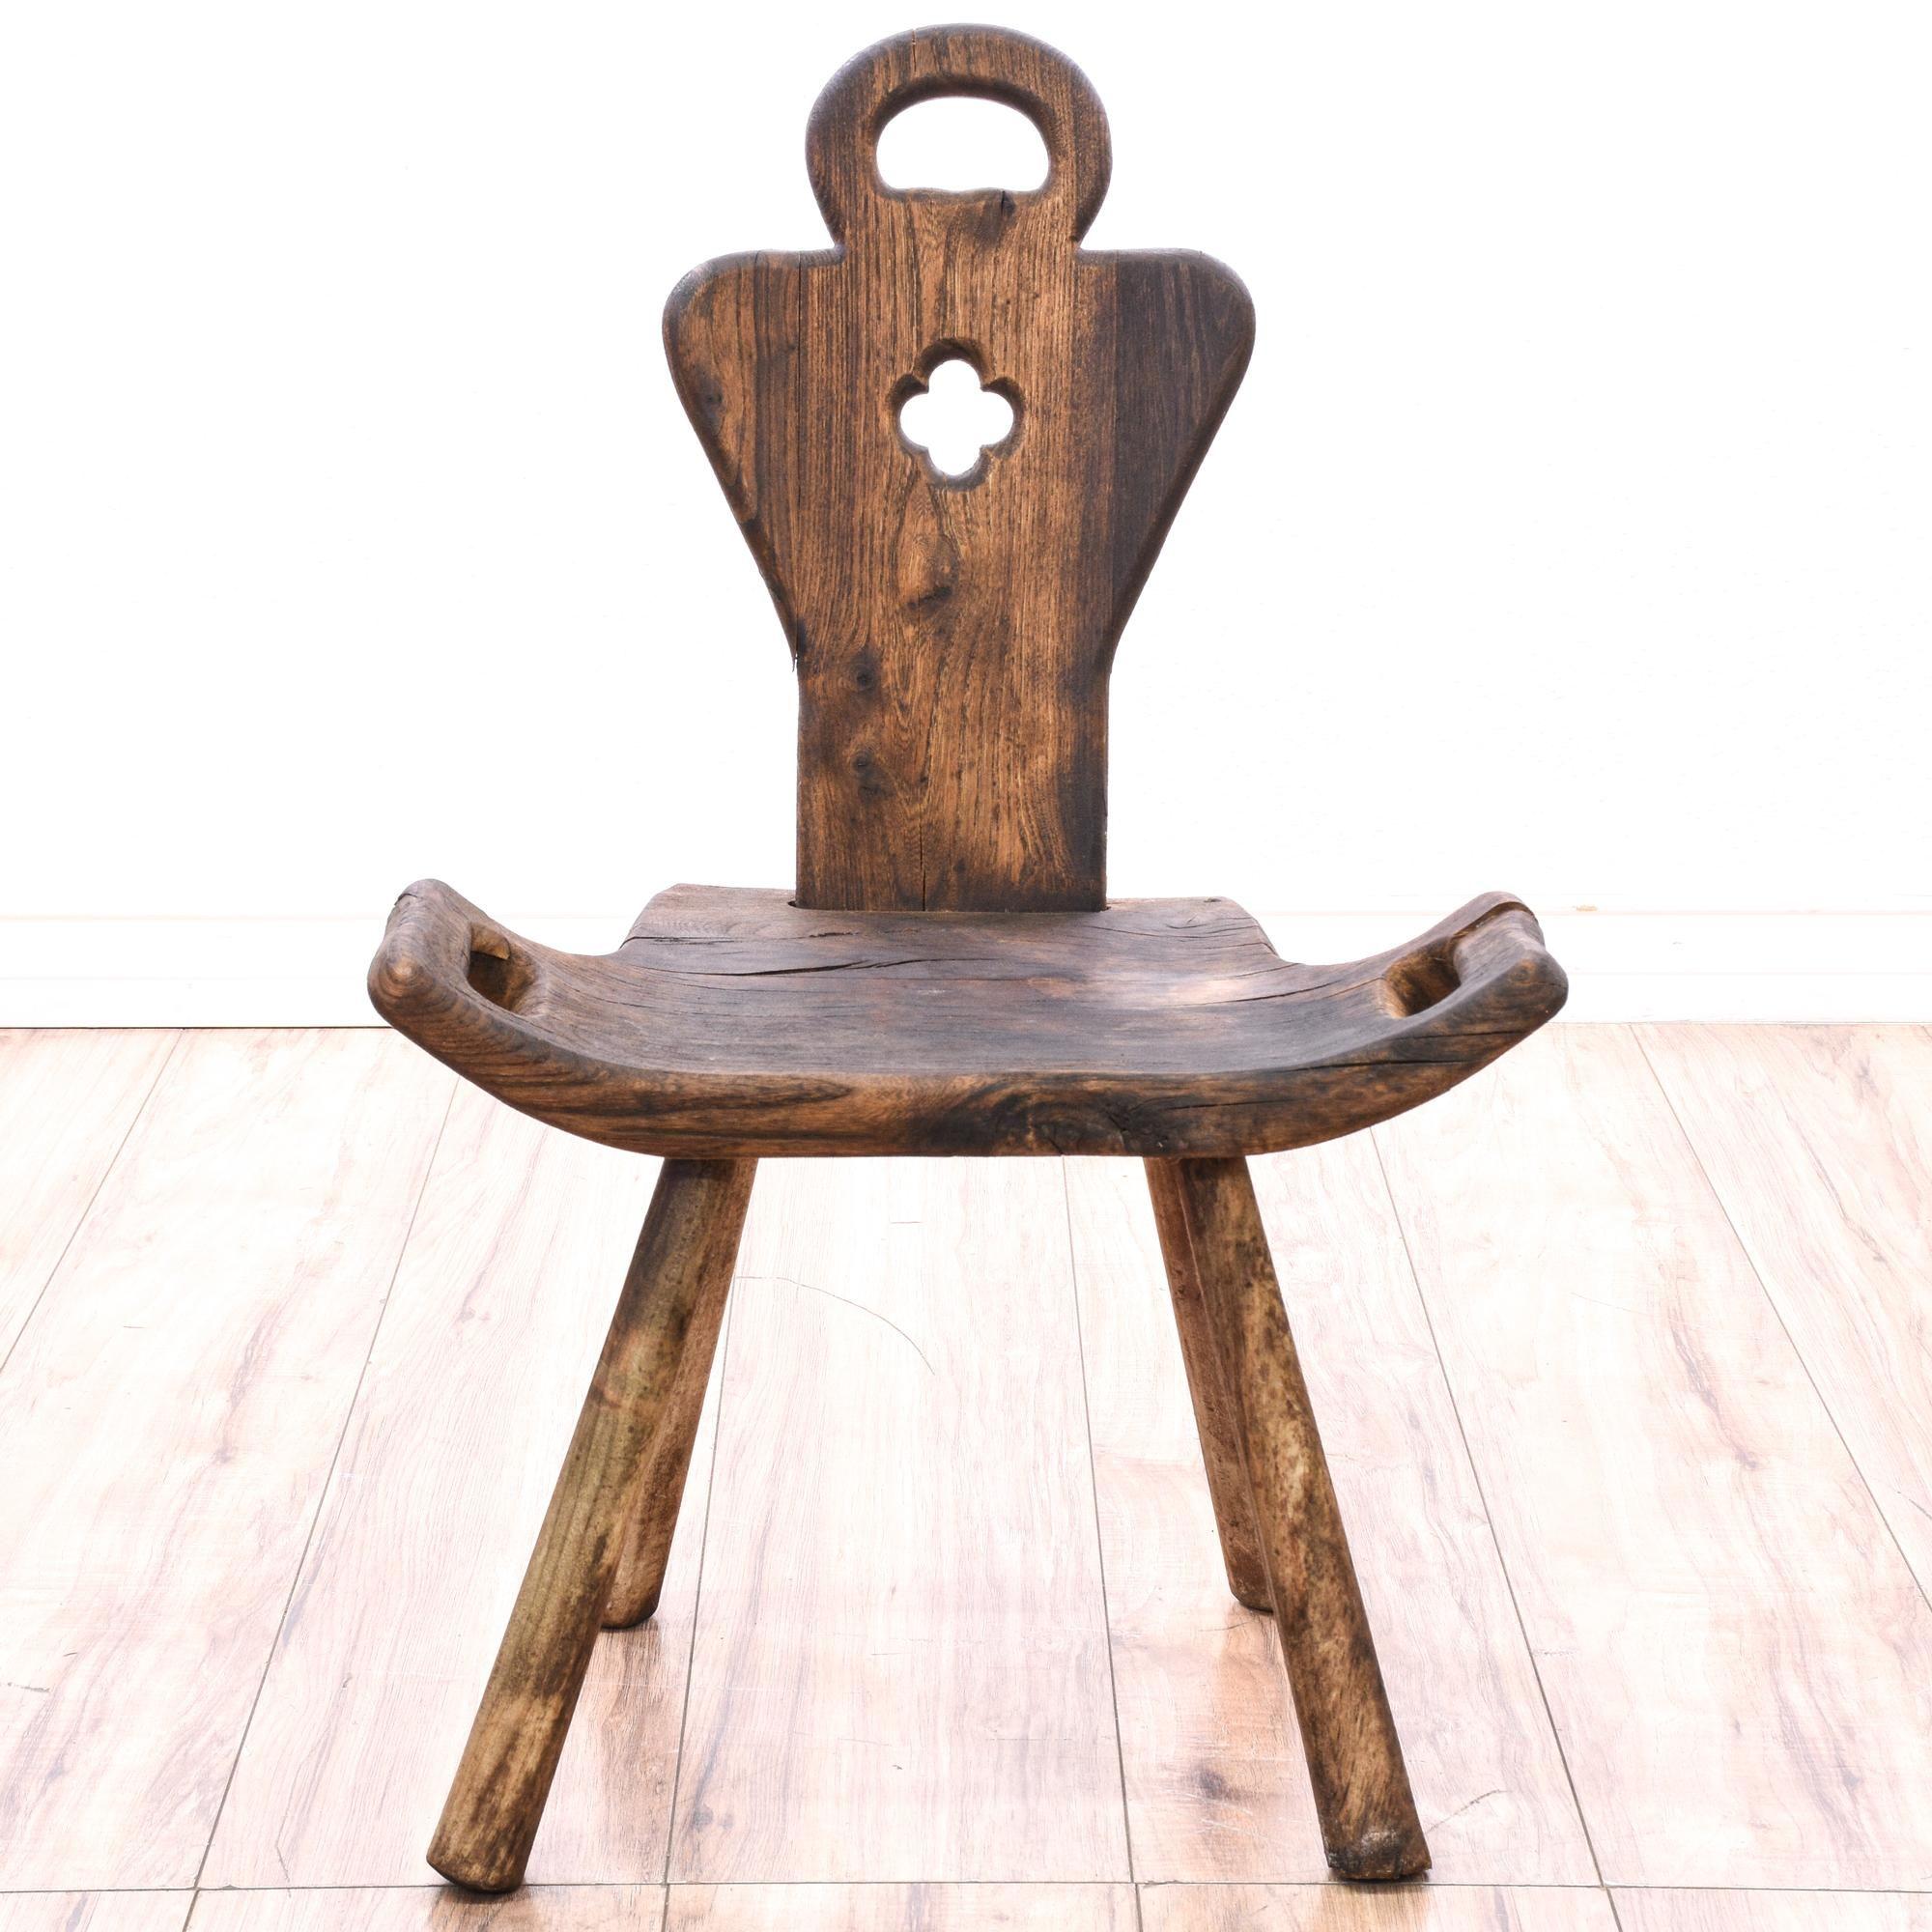 Modern birthing chair - Antique Arts Crafts Birthing Chair